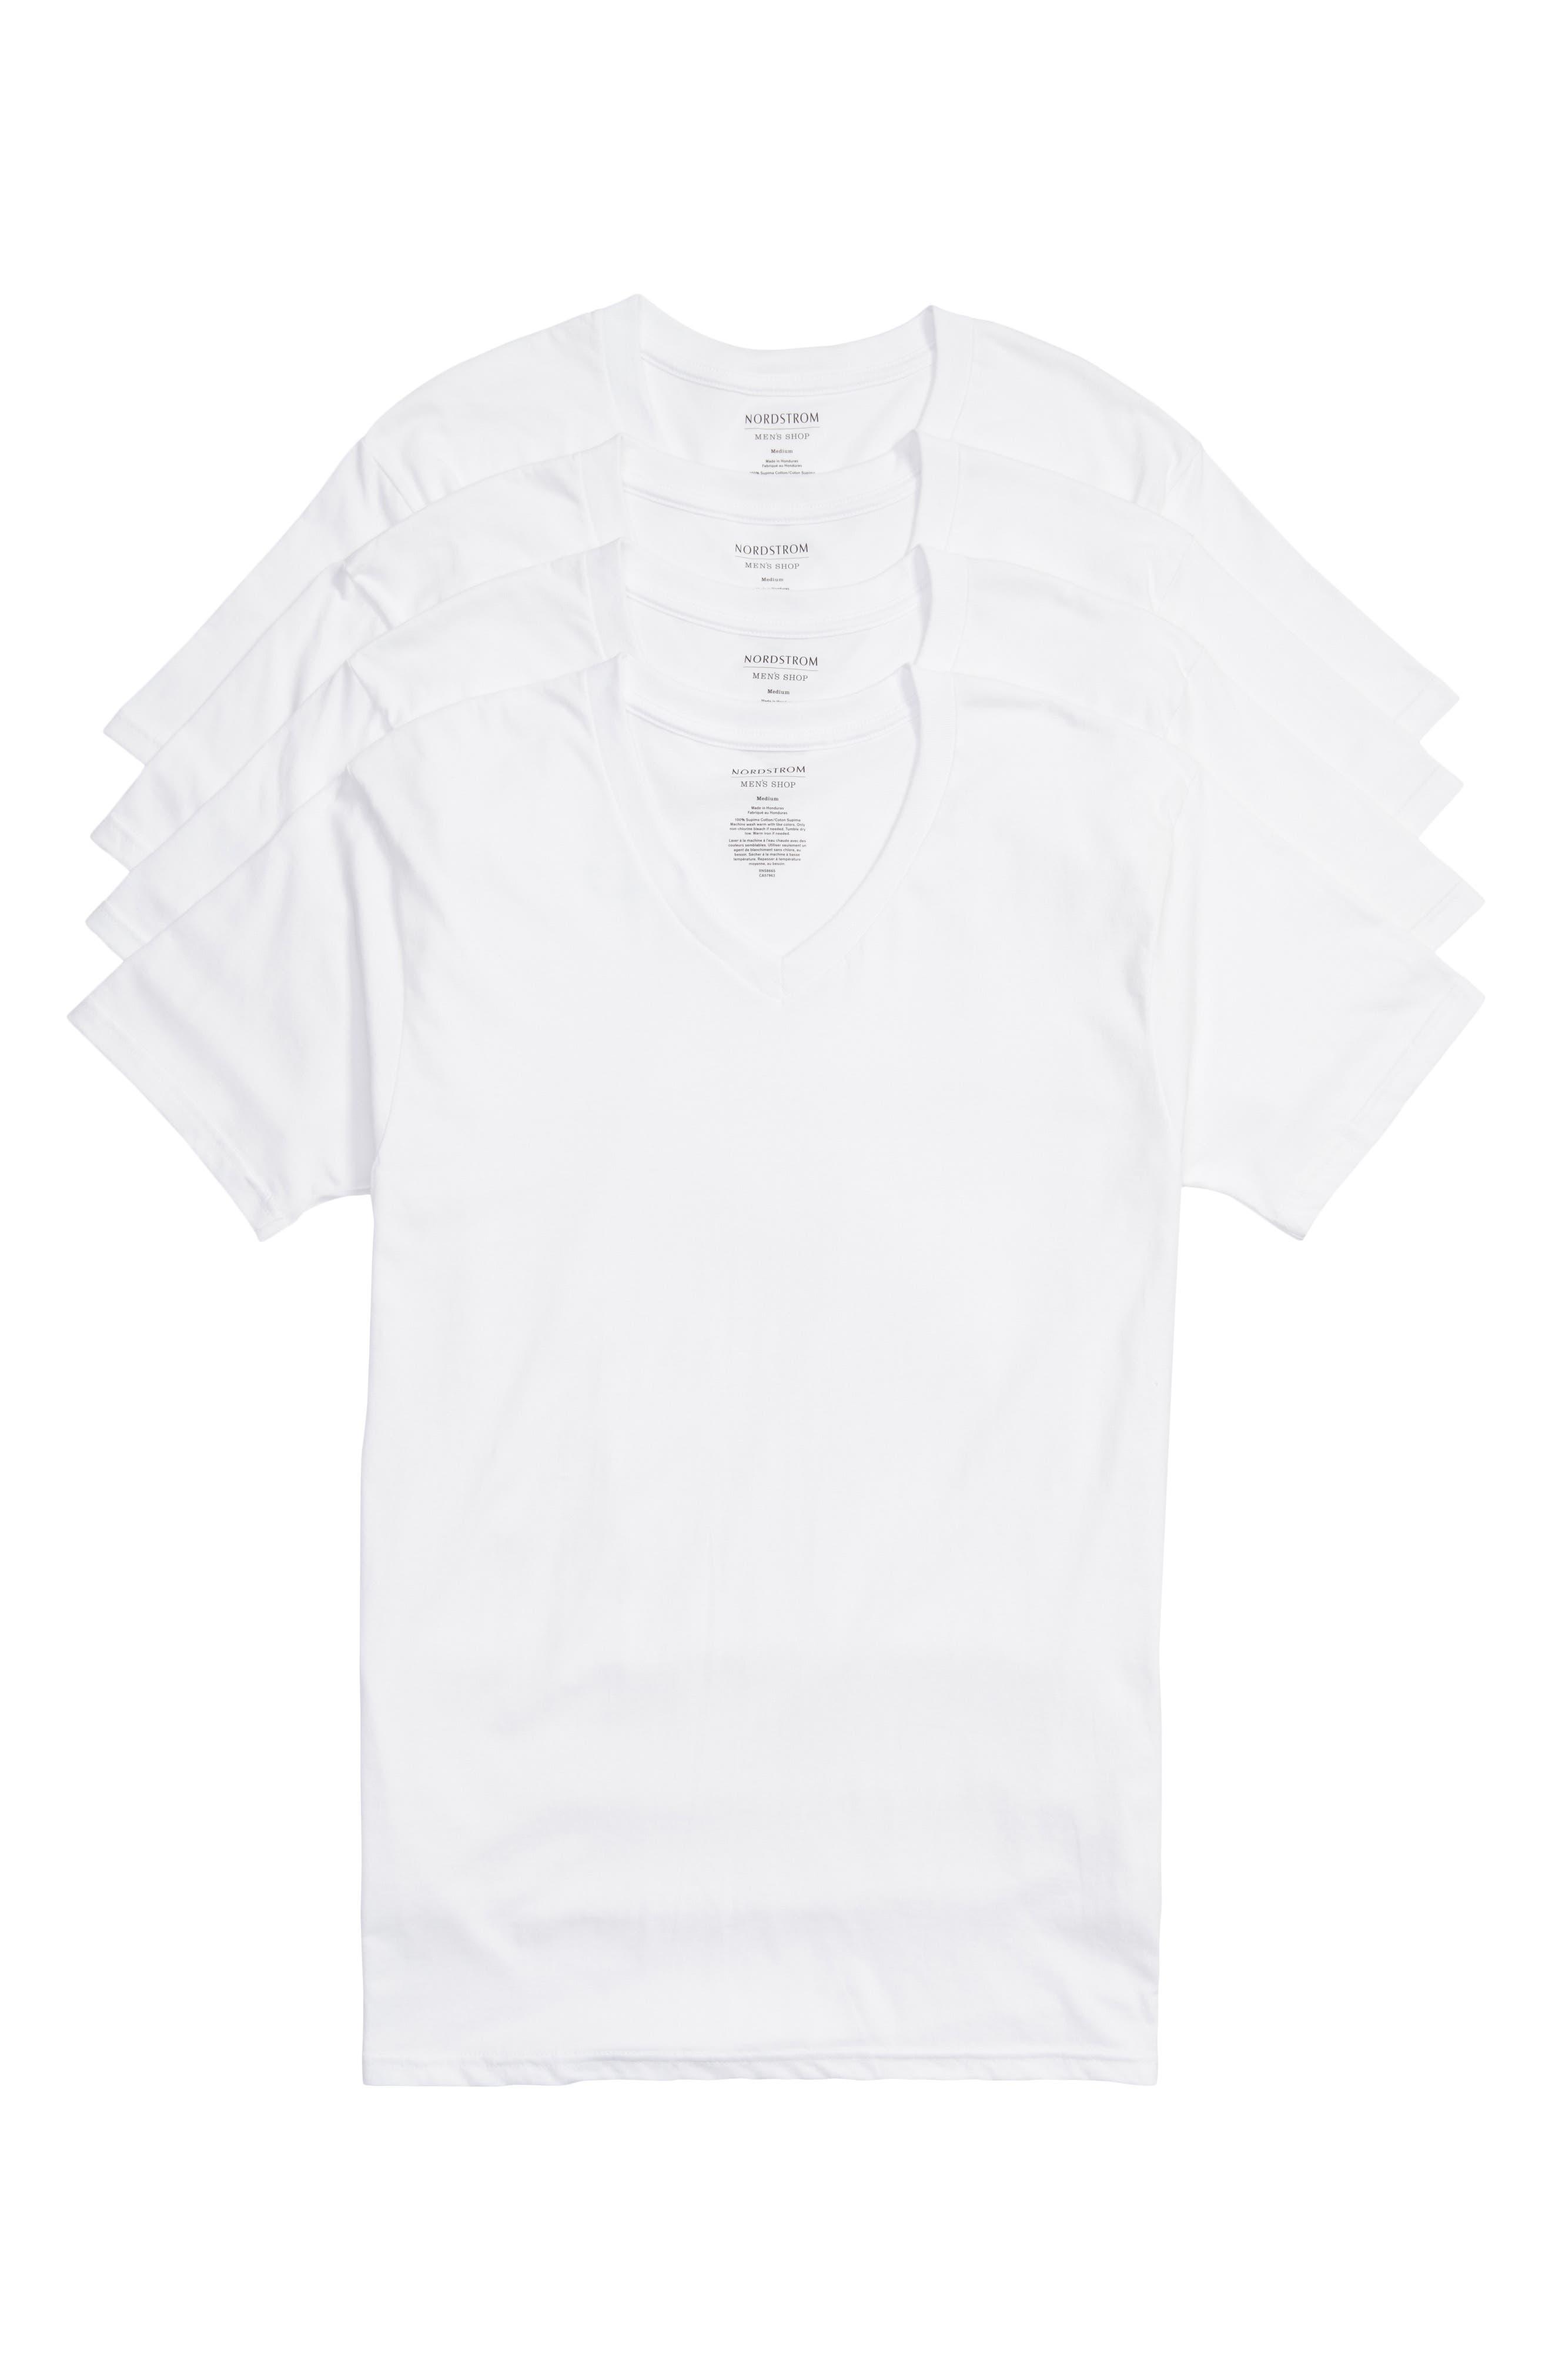 NORDSTROM MEN'S SHOP, 4-Pack Regular Fit Supima<sup>®</sup> Cotton V-Neck T-Shirts, Alternate thumbnail 6, color, WHITE